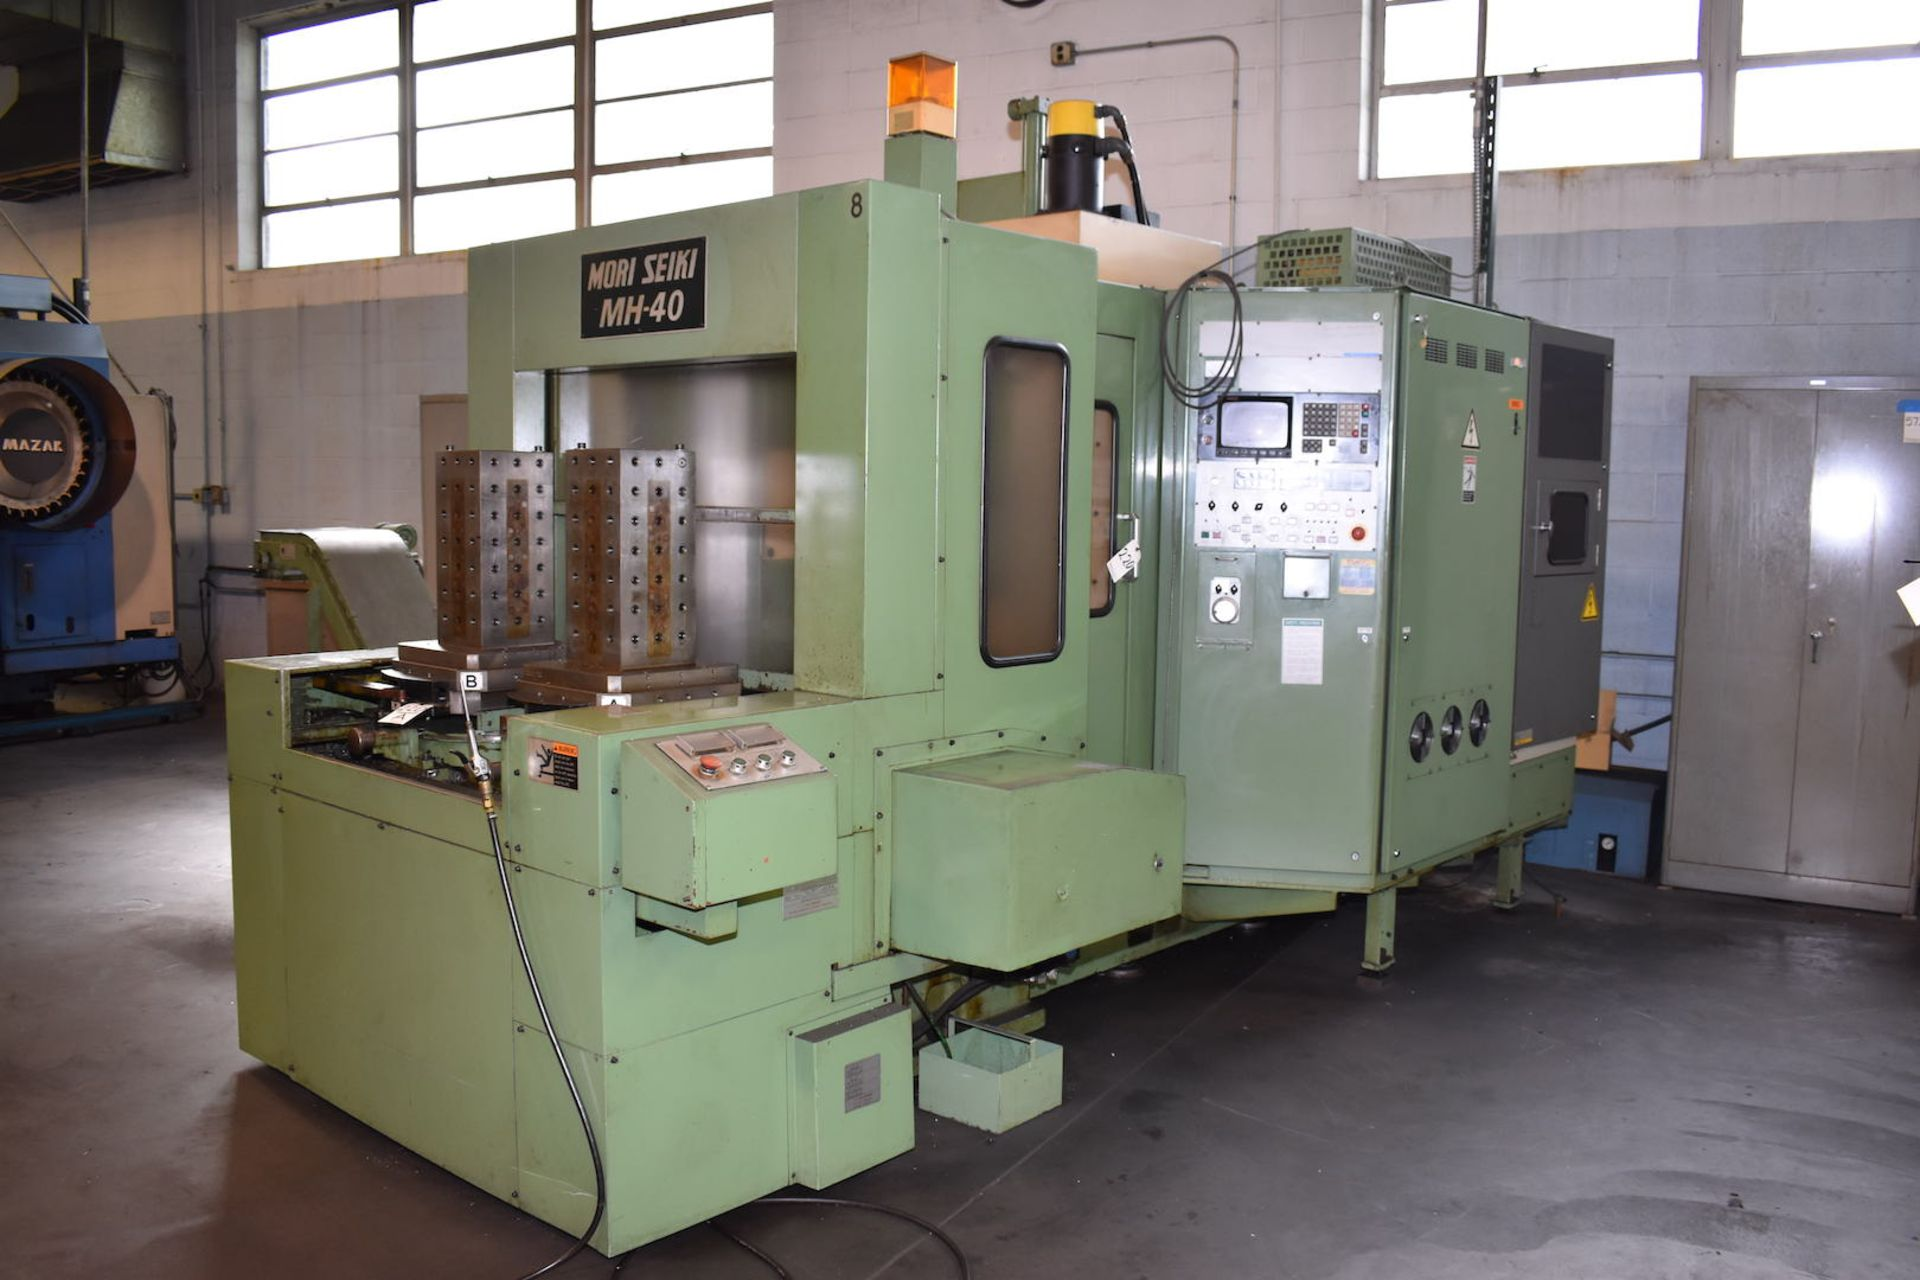 Lot 220 - Mori Seiki Model MH-40 CNC Horizontal Machining Center, S/N 76 (1984), Fanuc System 11-M Control,